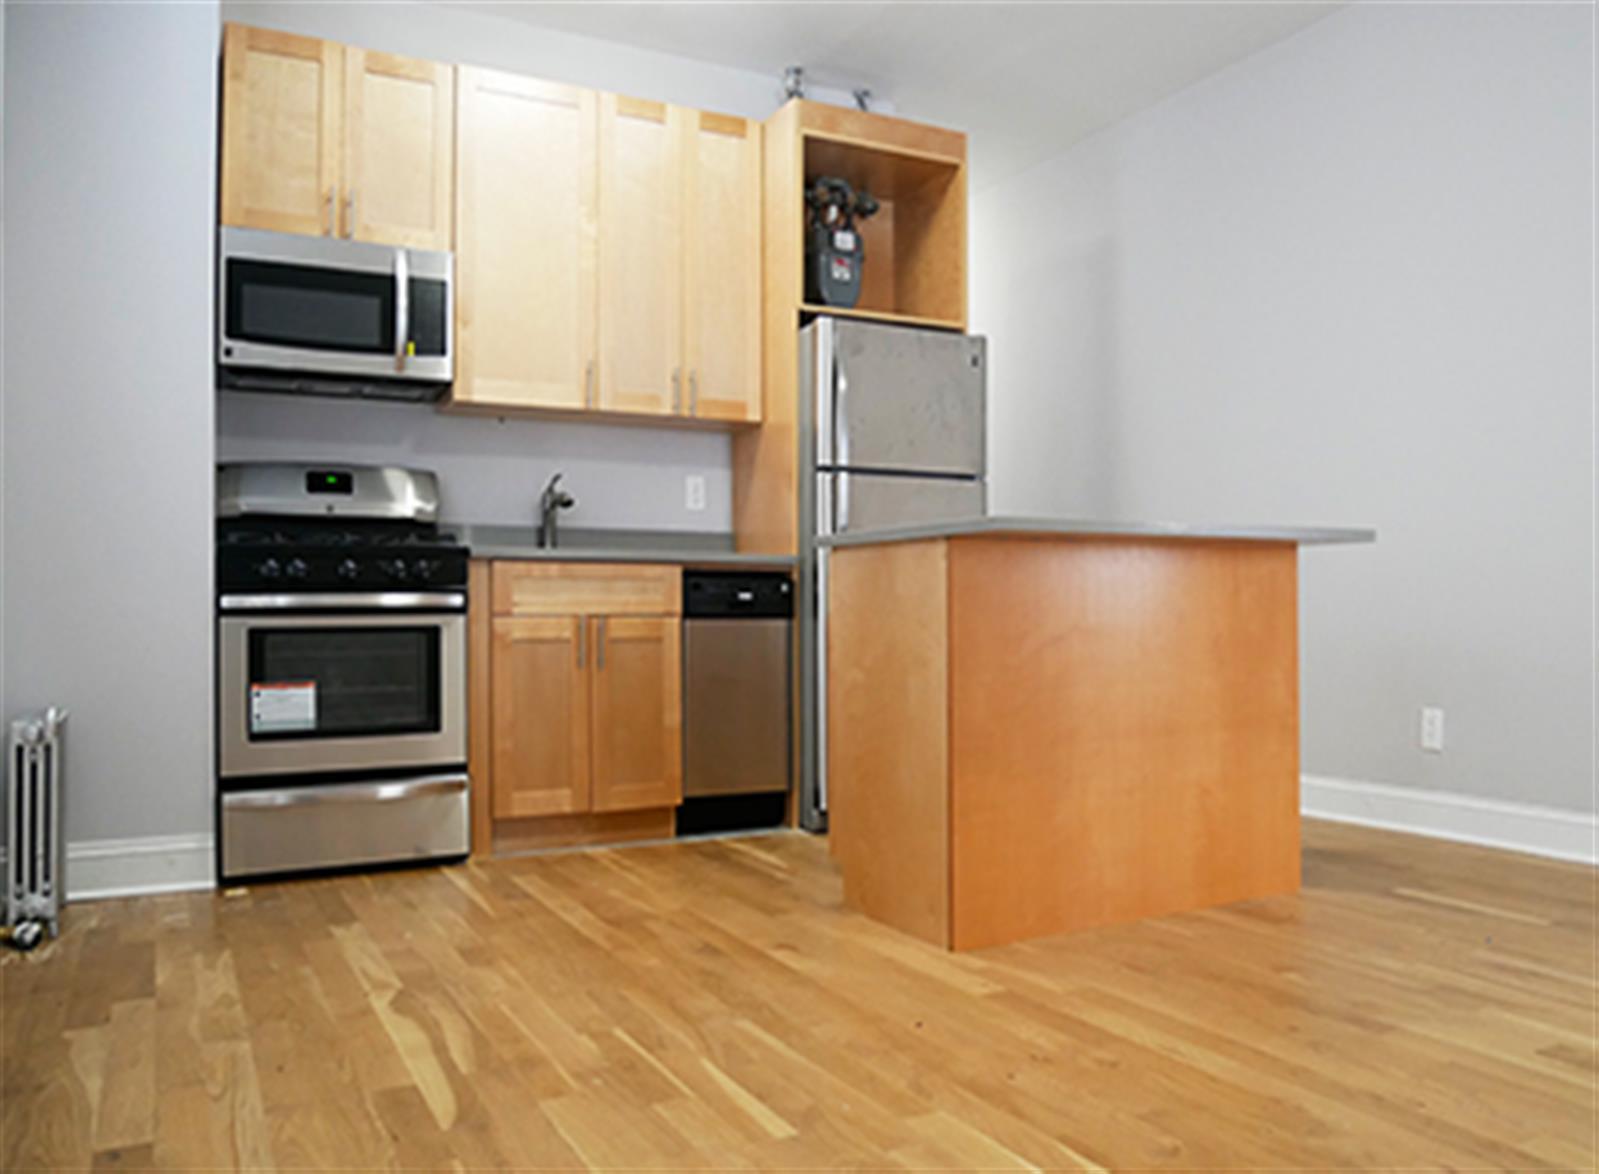 FOUR BEDROOM - Washington Heights